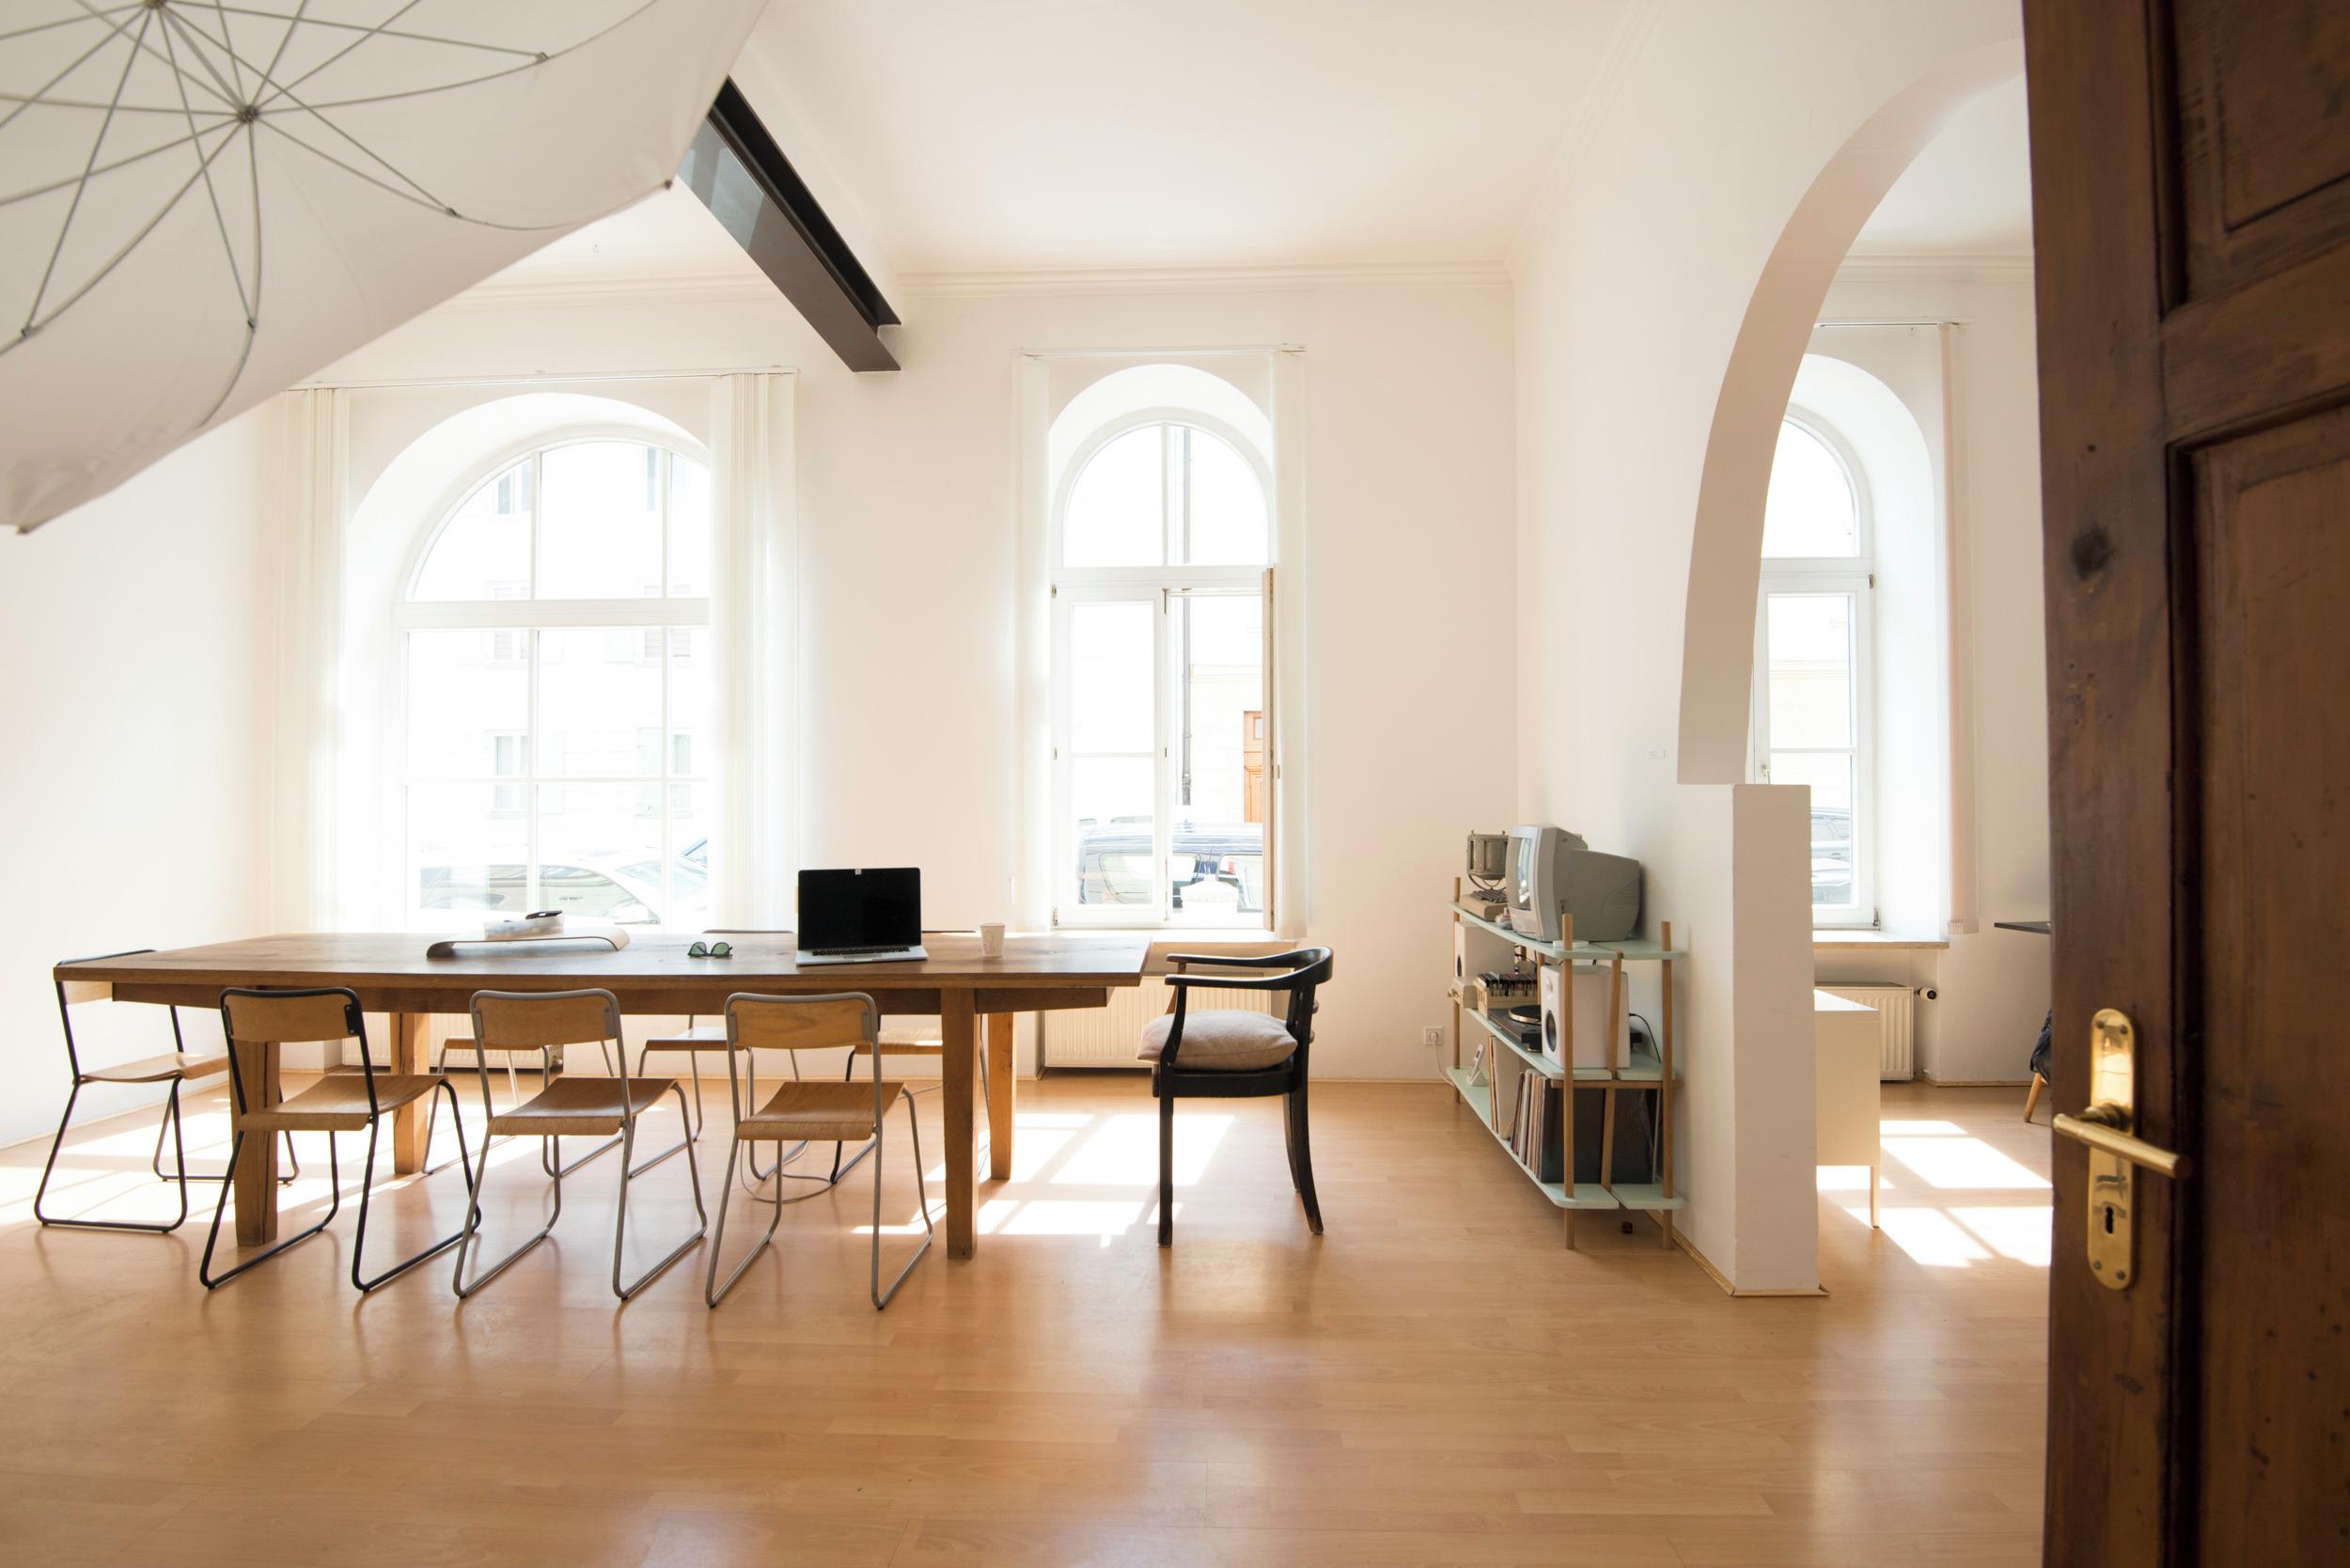 atelier bergstadt mieten in m nchen. Black Bedroom Furniture Sets. Home Design Ideas